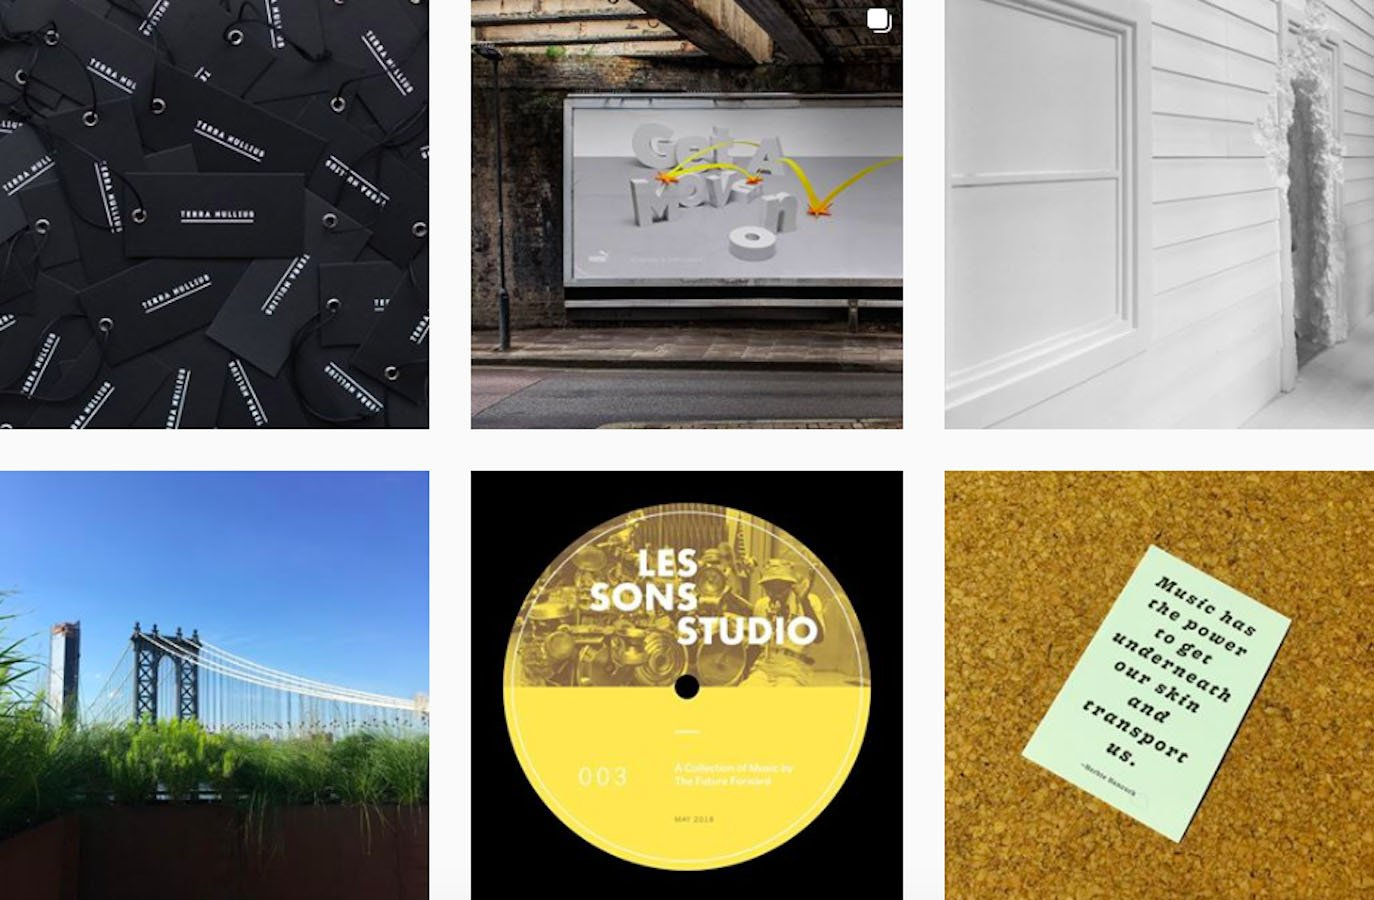 Web Design Inspiration: 110+ Accounts On Instagram and 10+ Best UX & Web Design Books in 2020 - thefutureforward